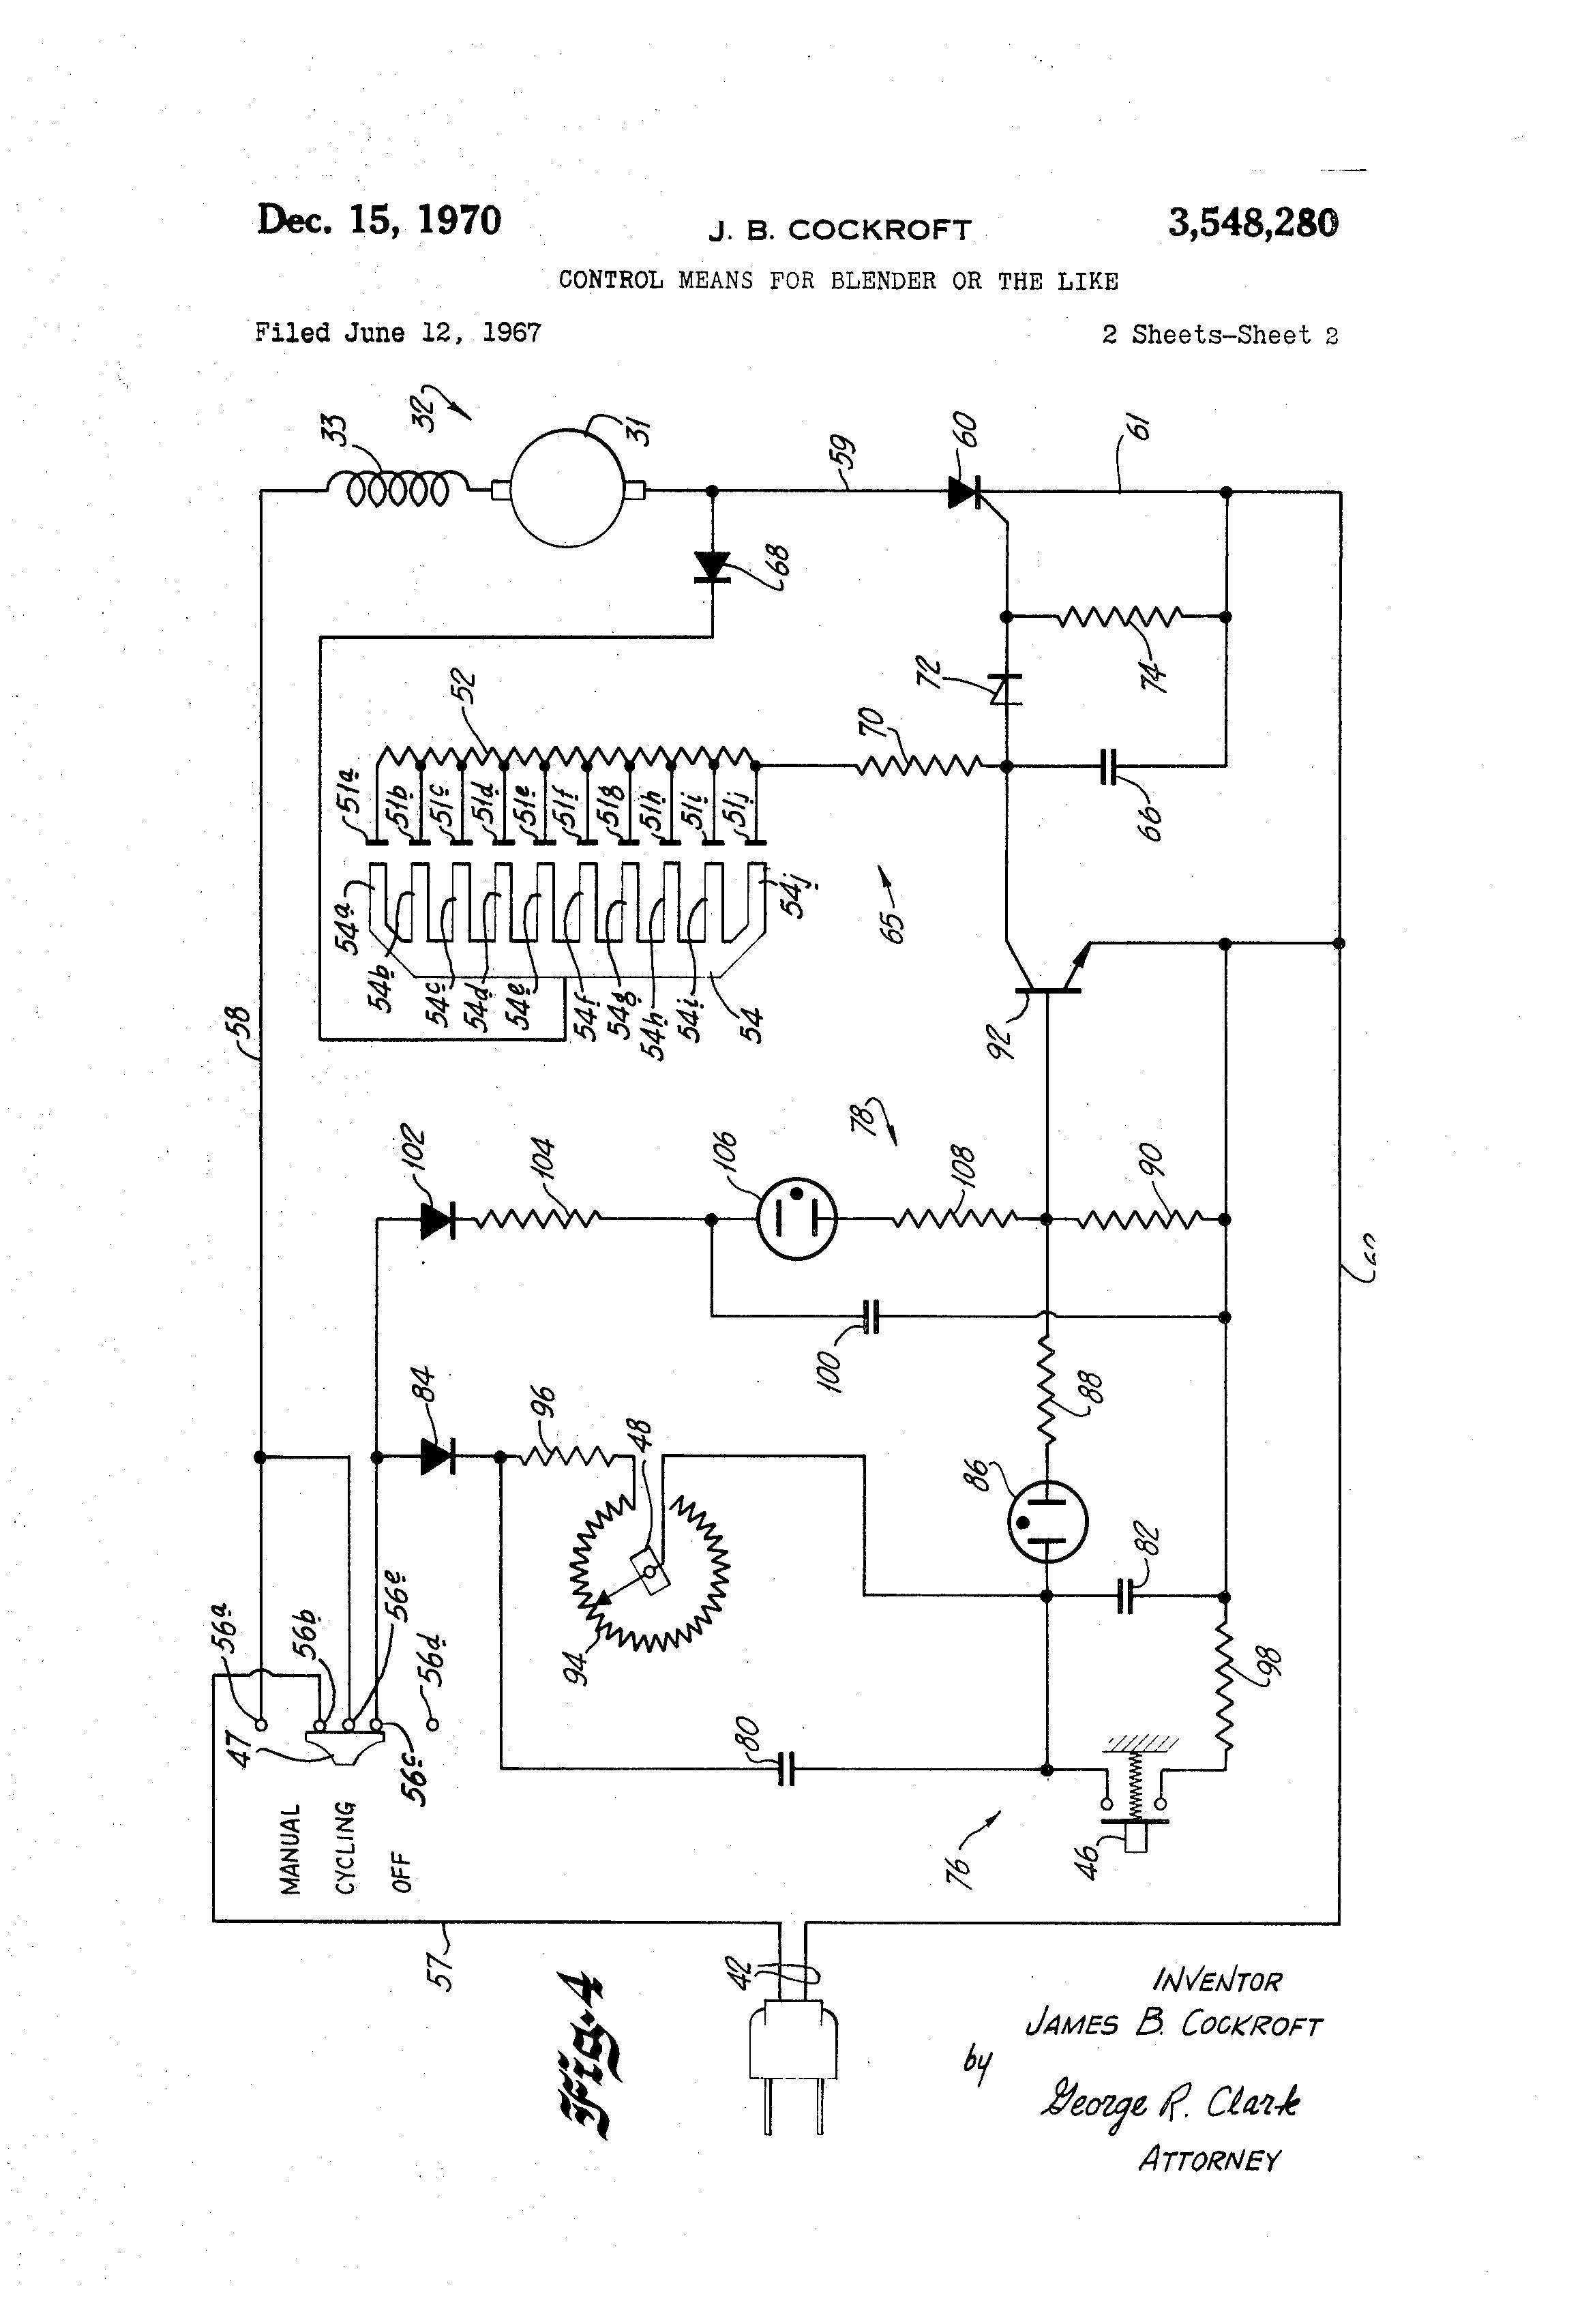 oster 18 speed blender manual